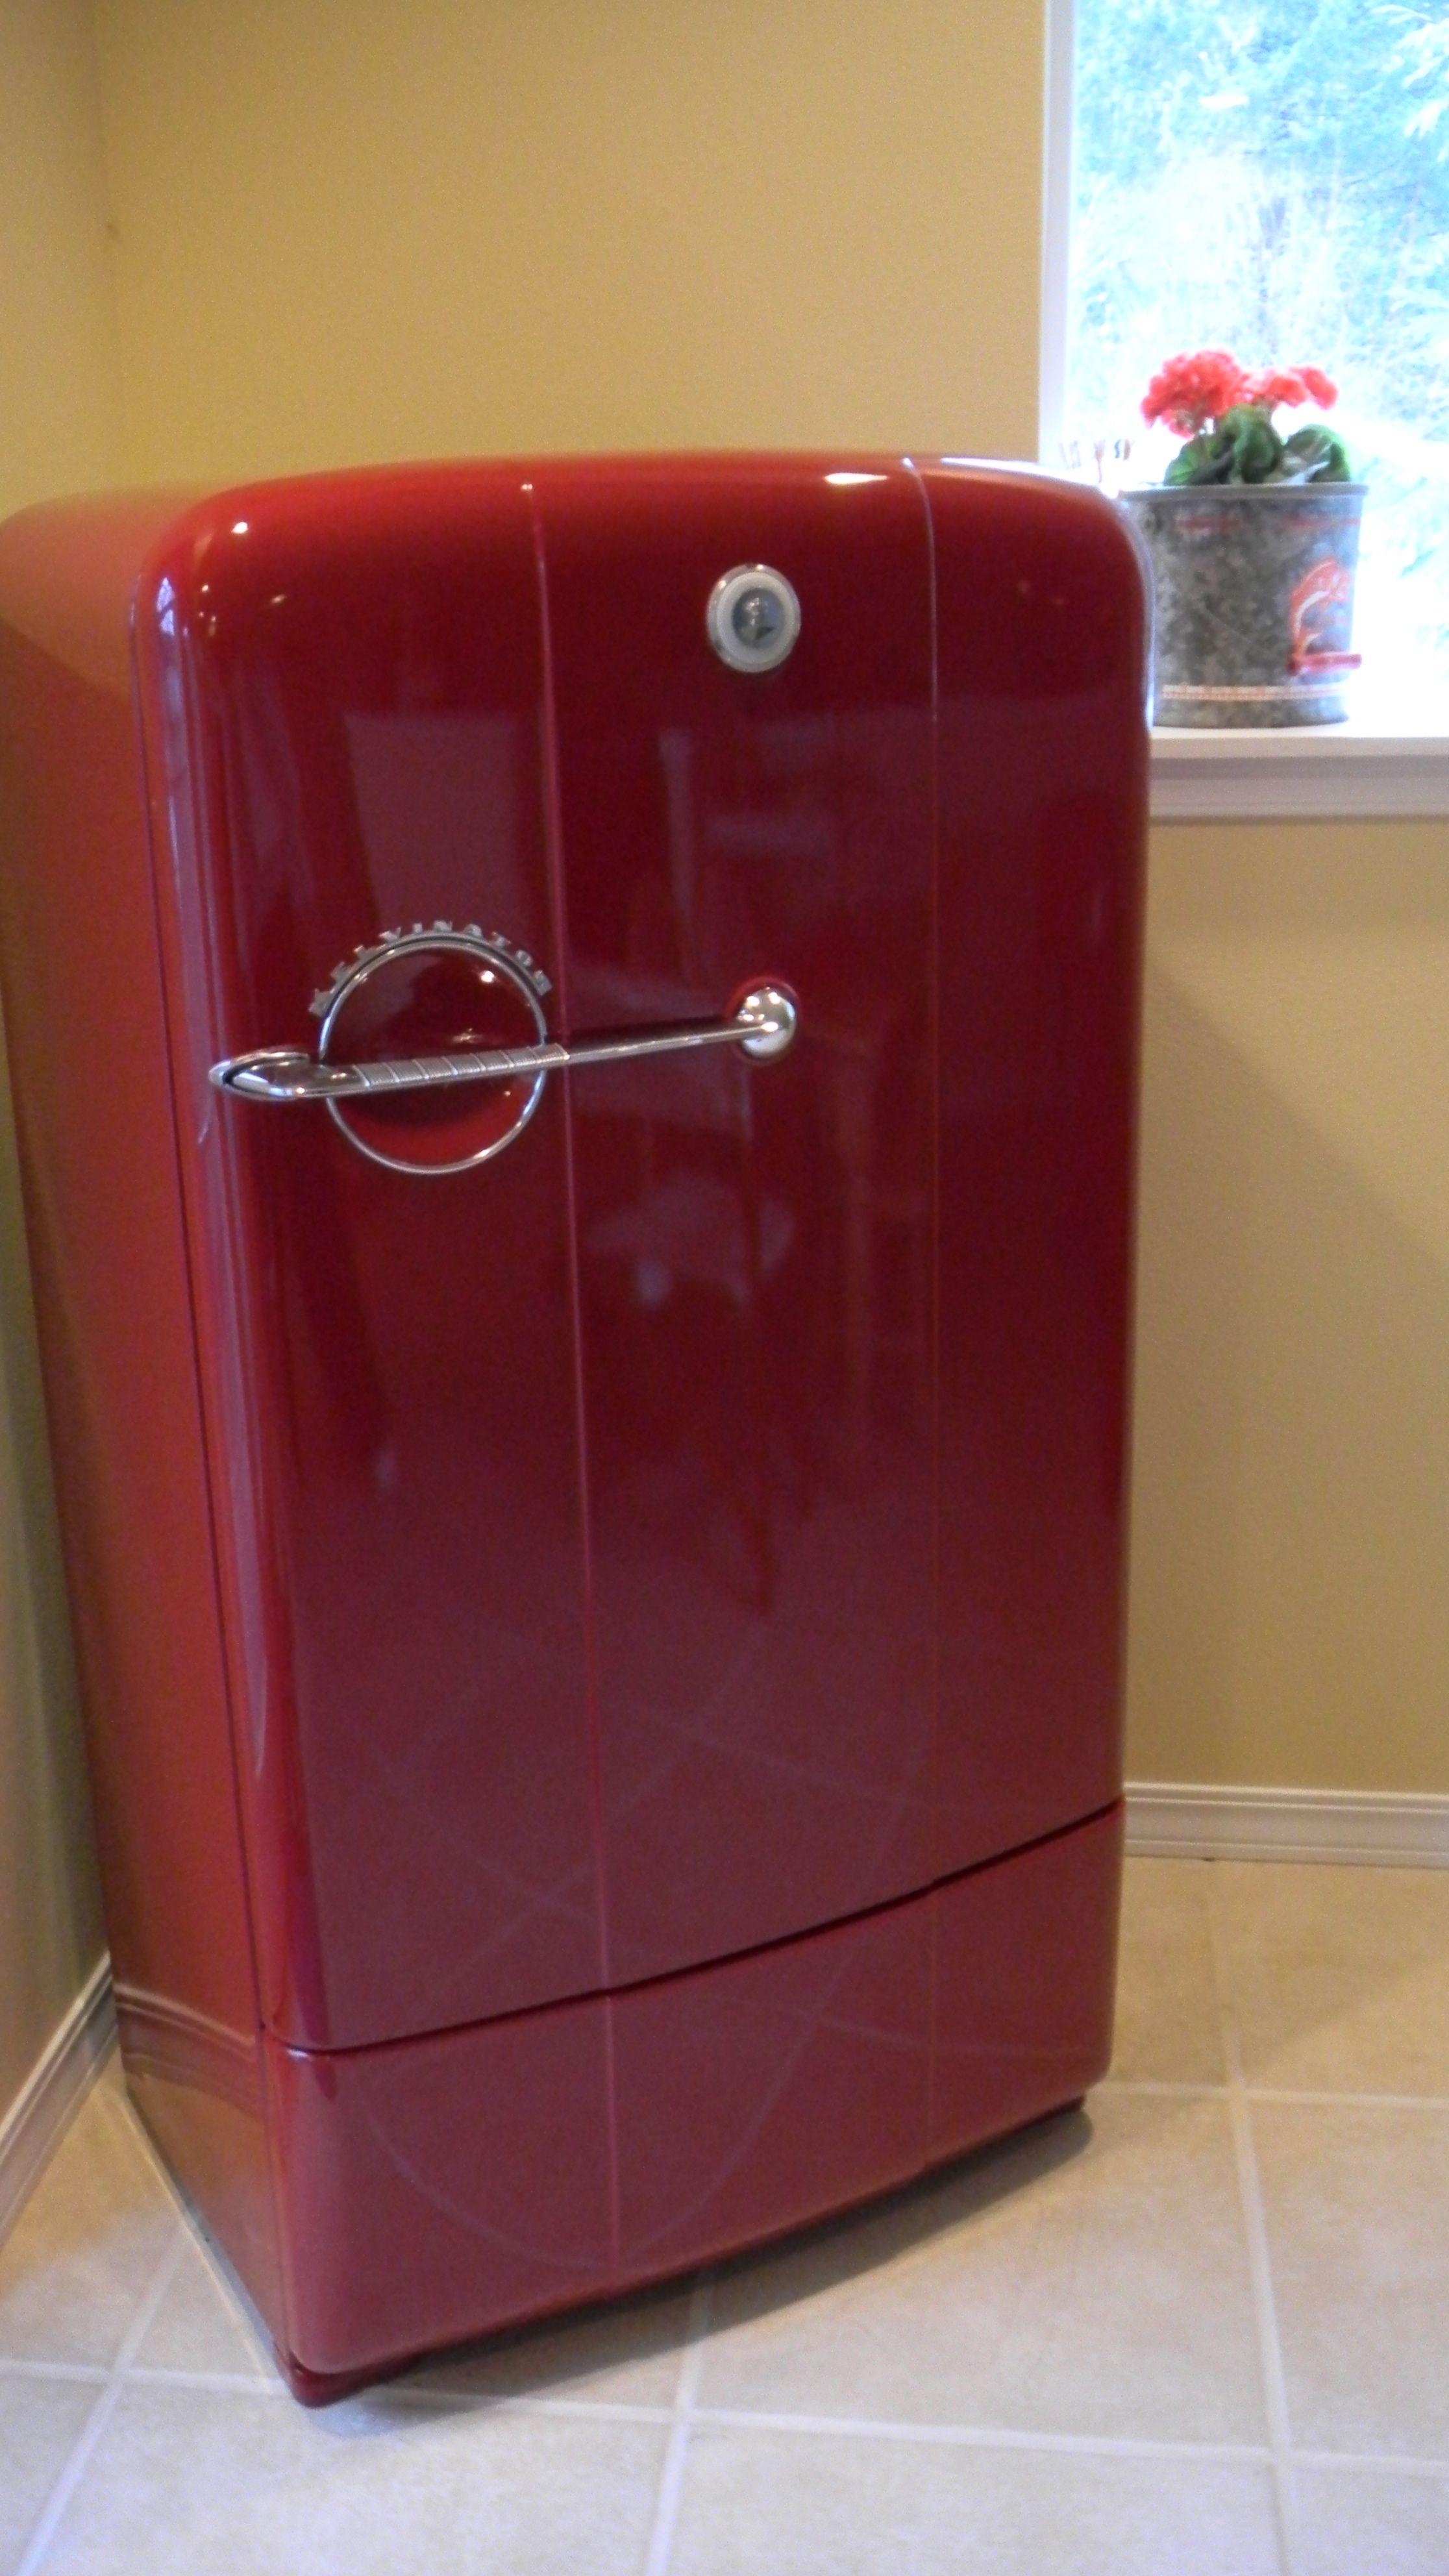 Retro fridge with a new paint job sheus a favorite we bought a